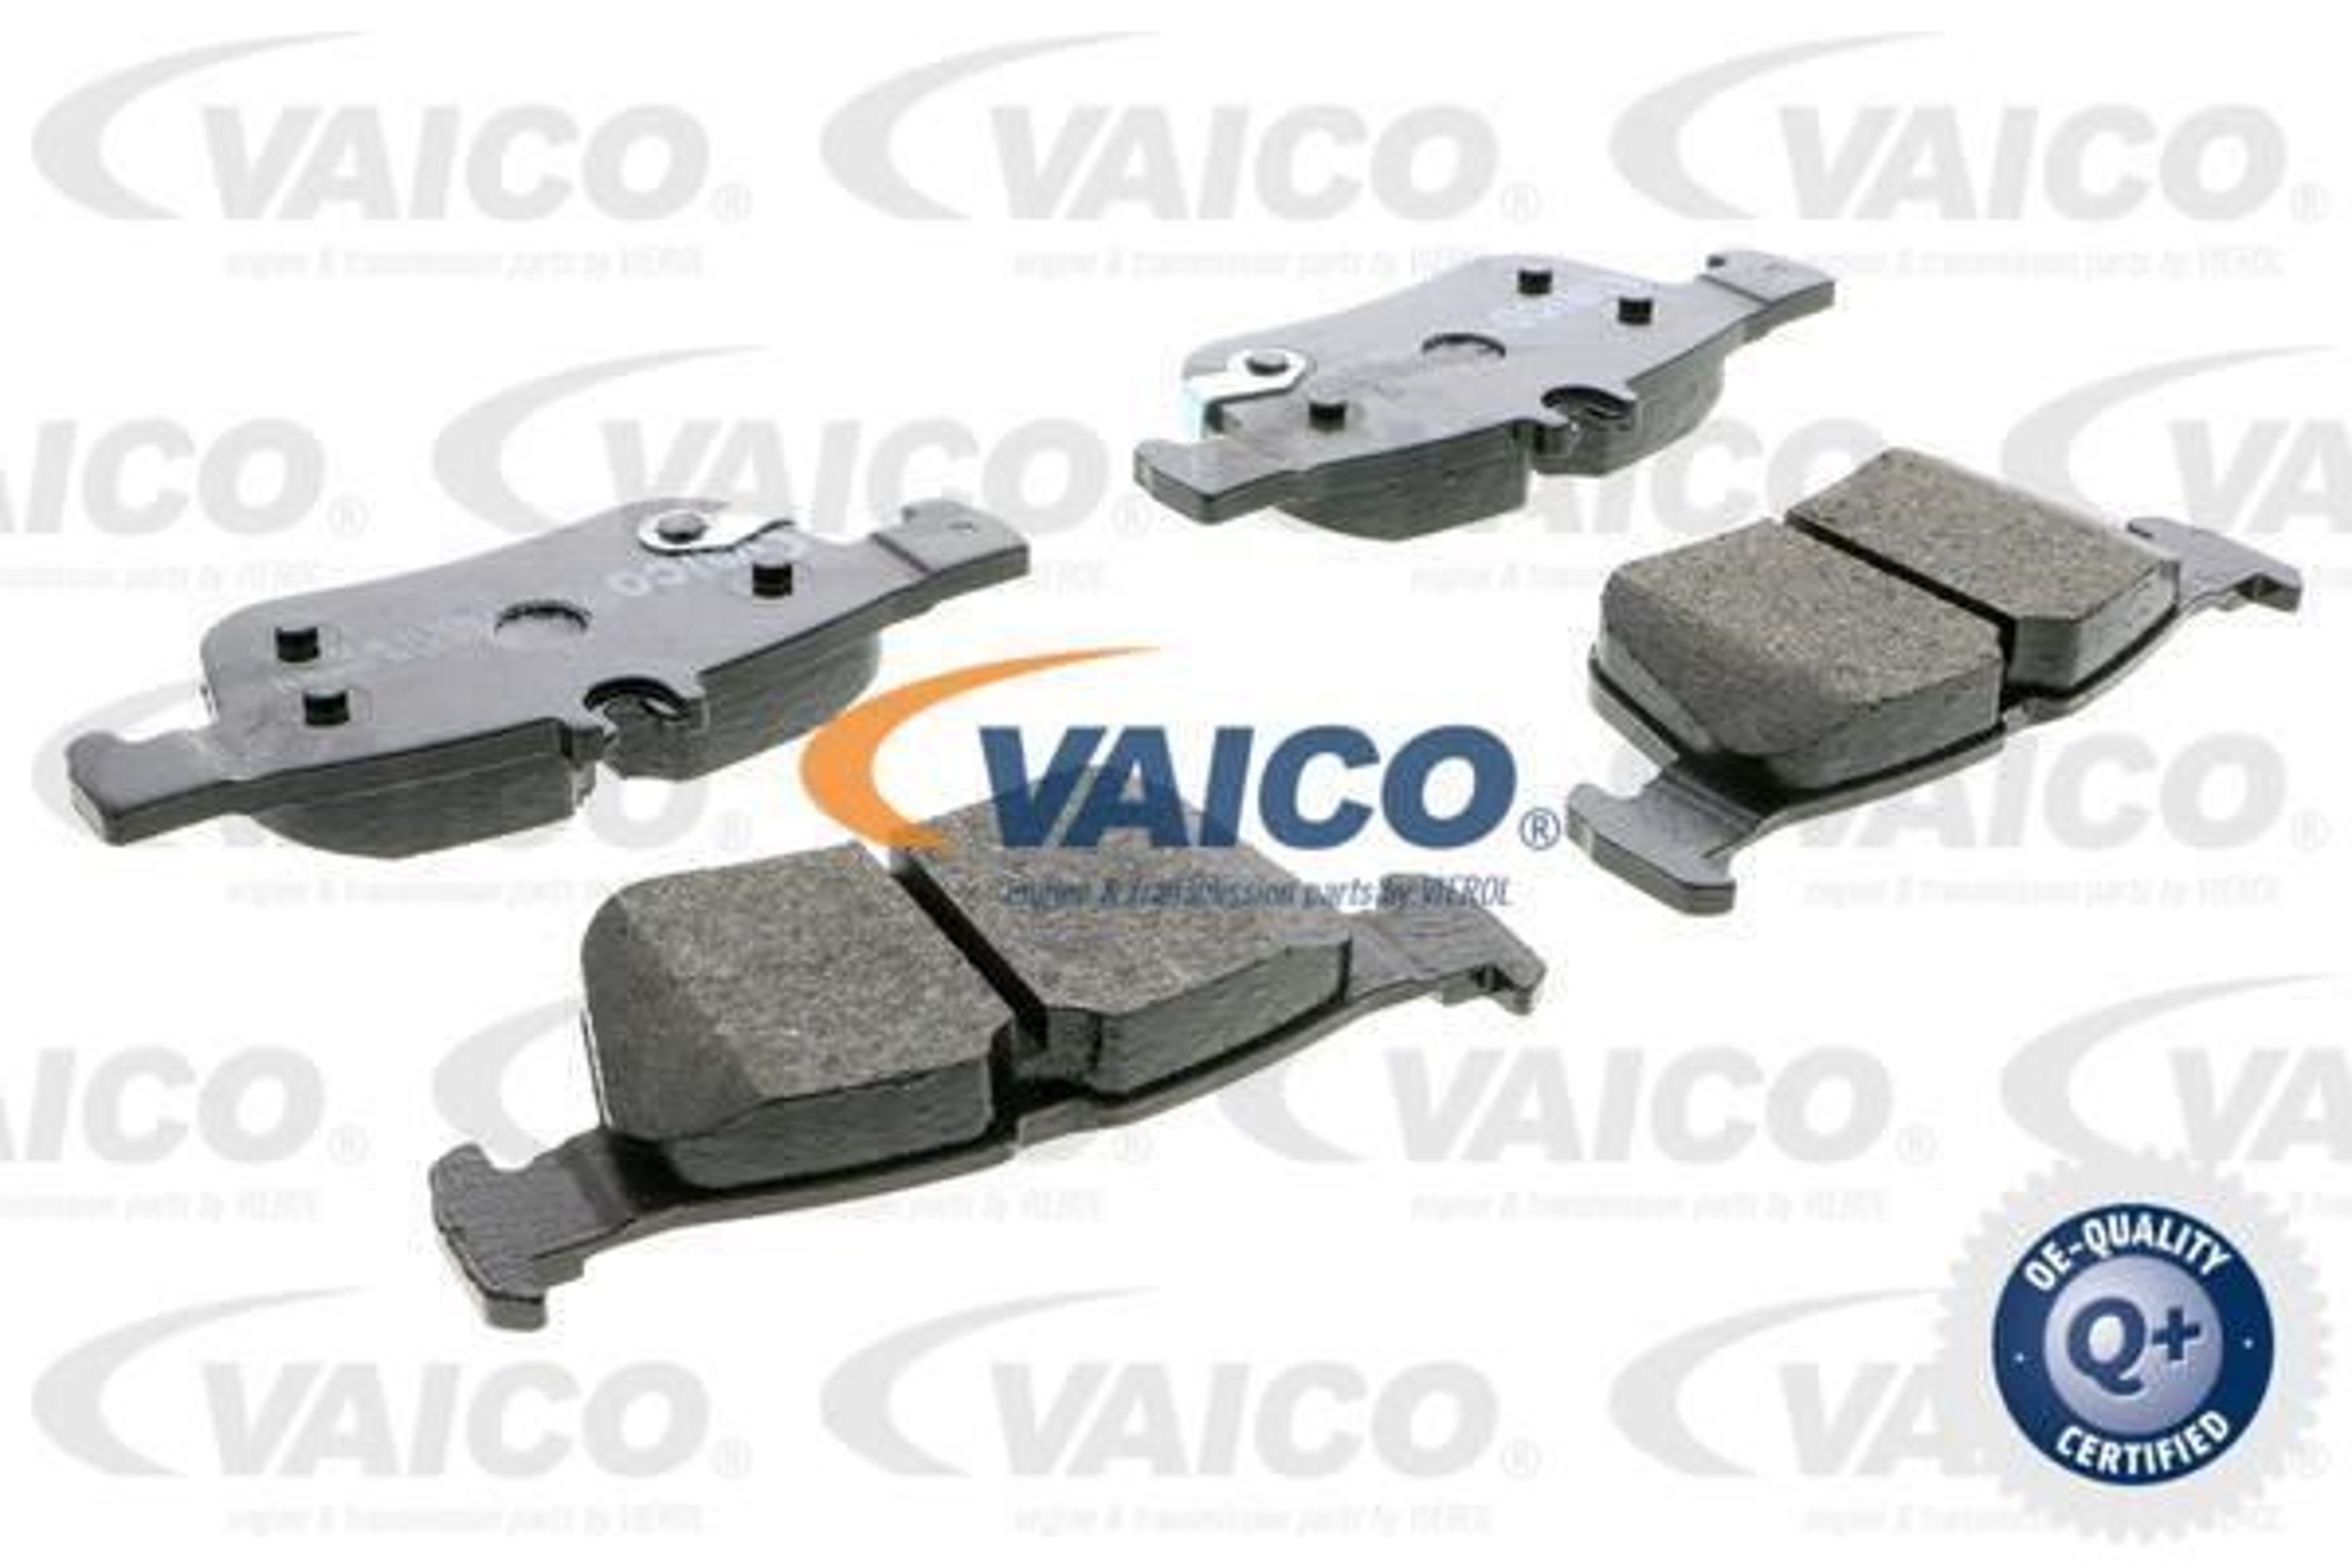 V251775 Bremsbeläge VAICO V25-1775 - Große Auswahl - stark reduziert